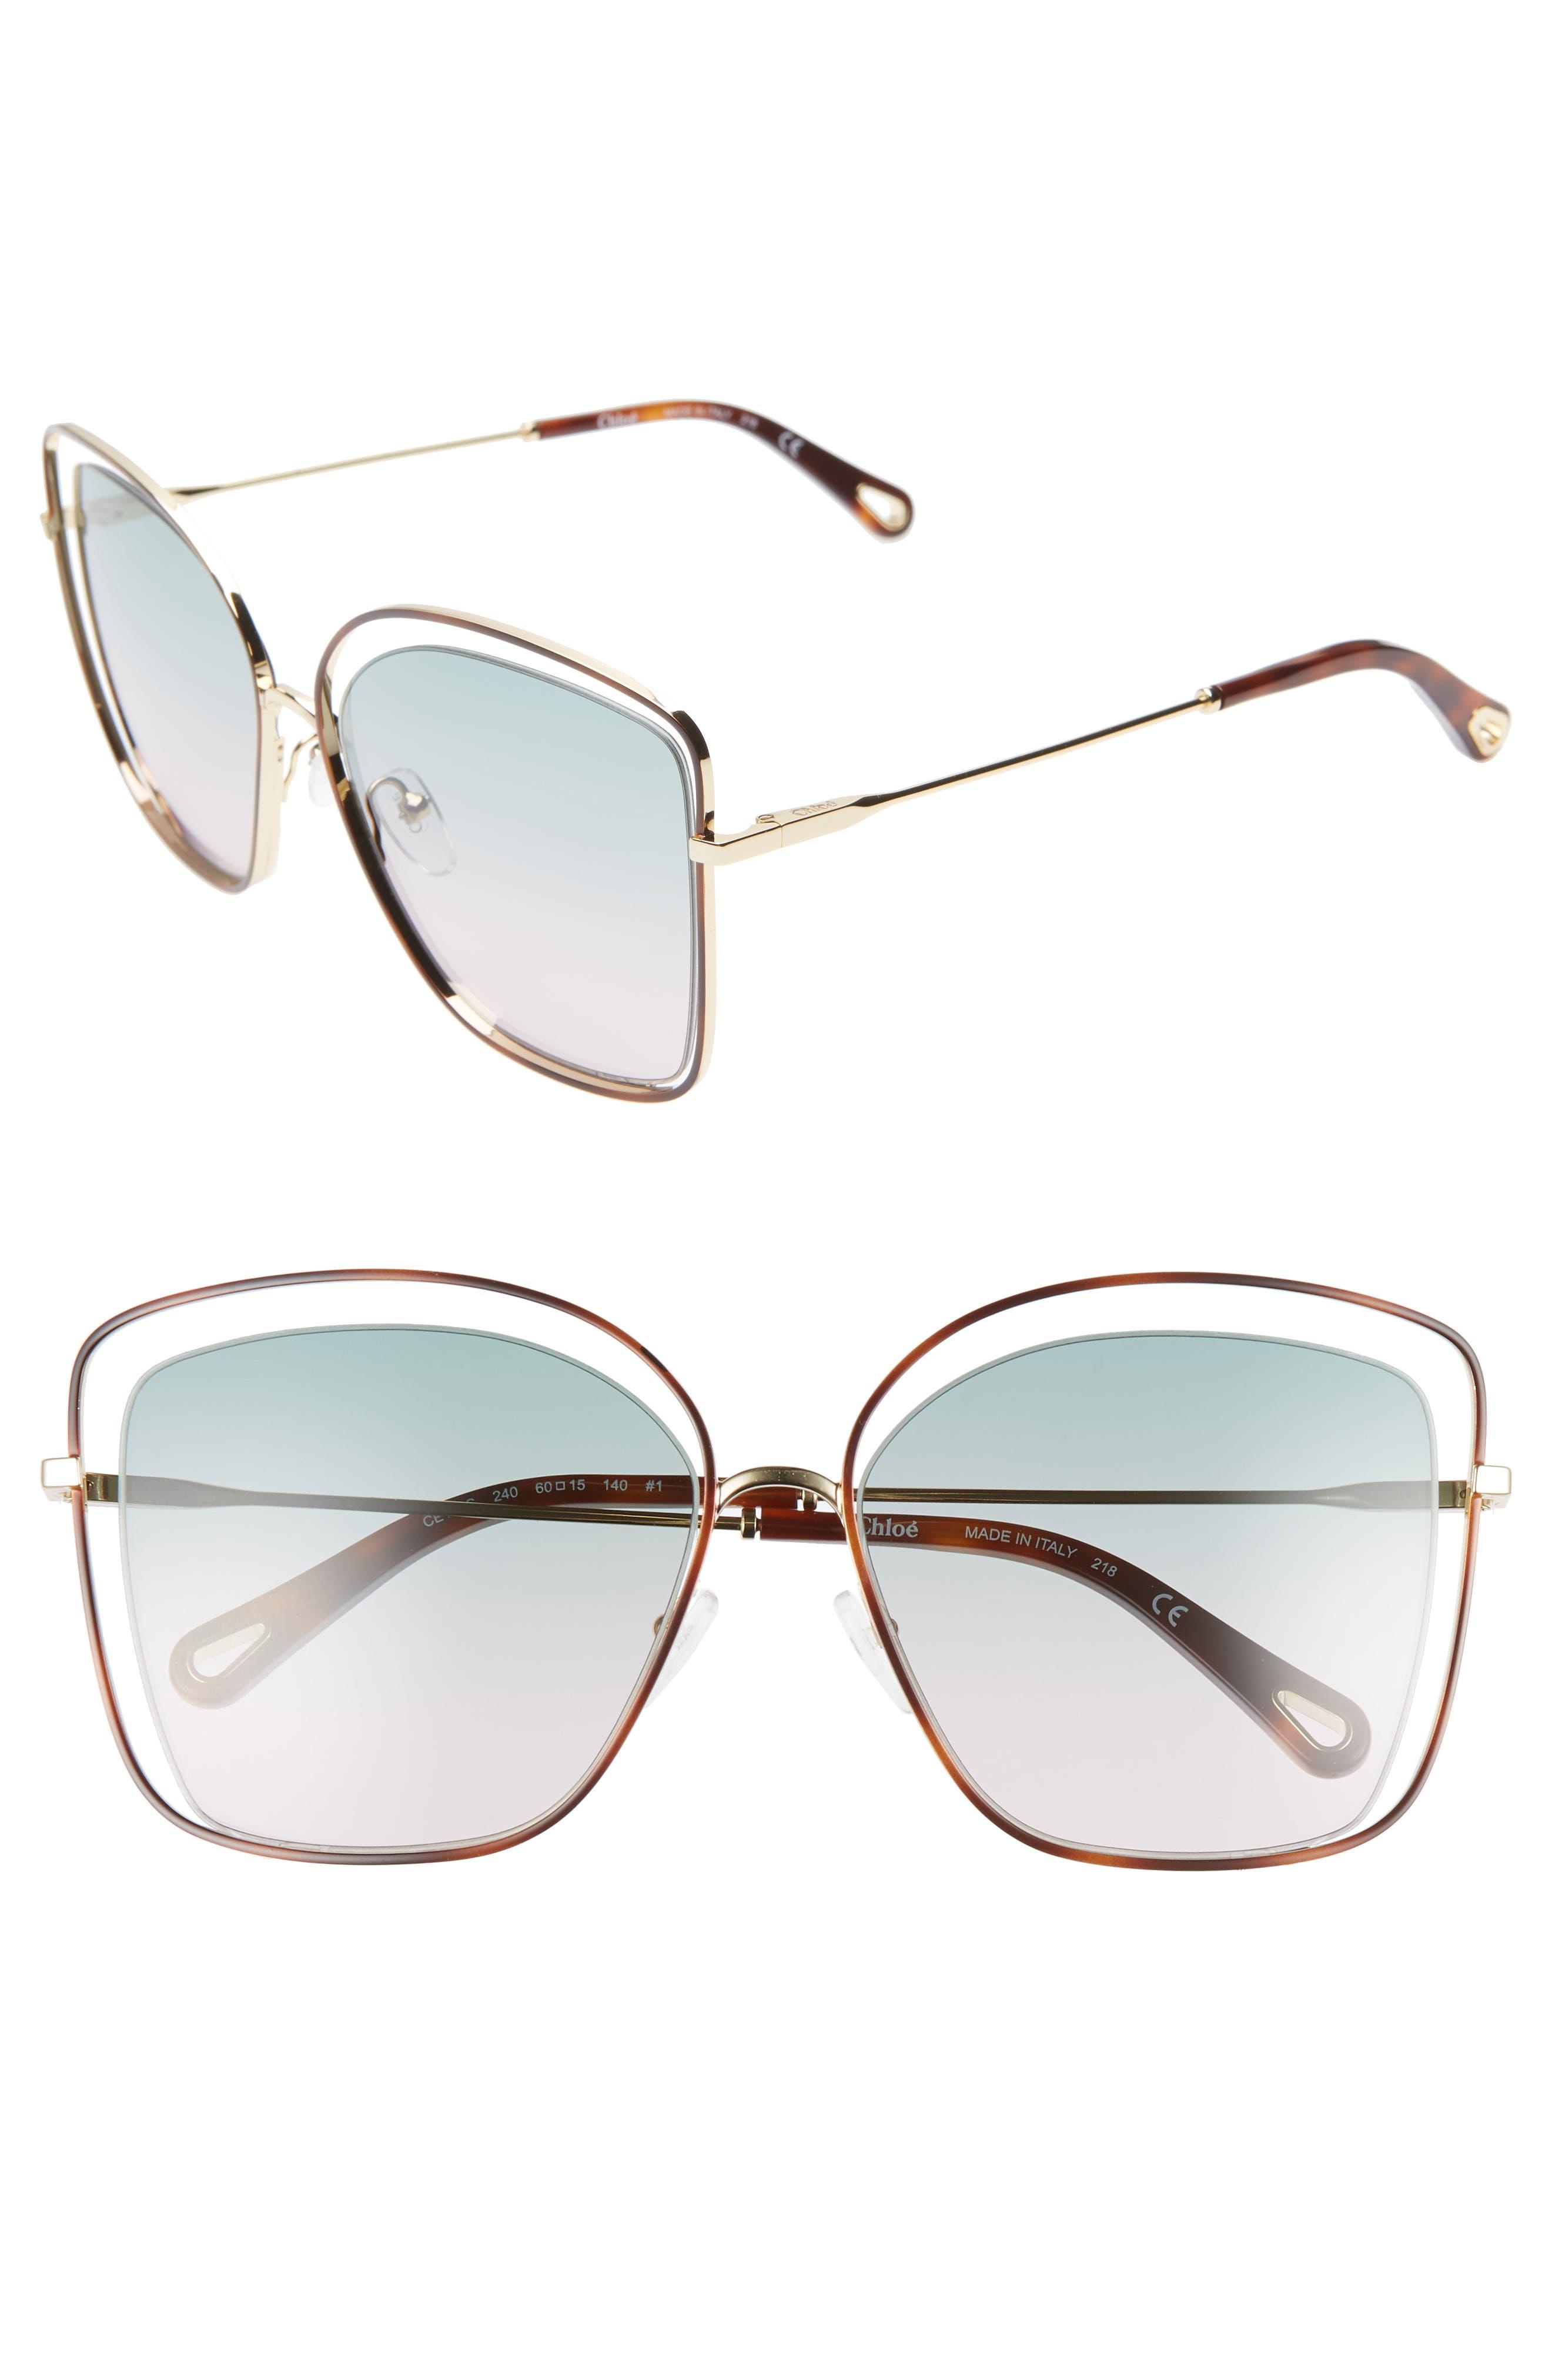 60mm Halo Frame Sunglasses,                         Main,                         color, HAVANA/ GREEN ROSE